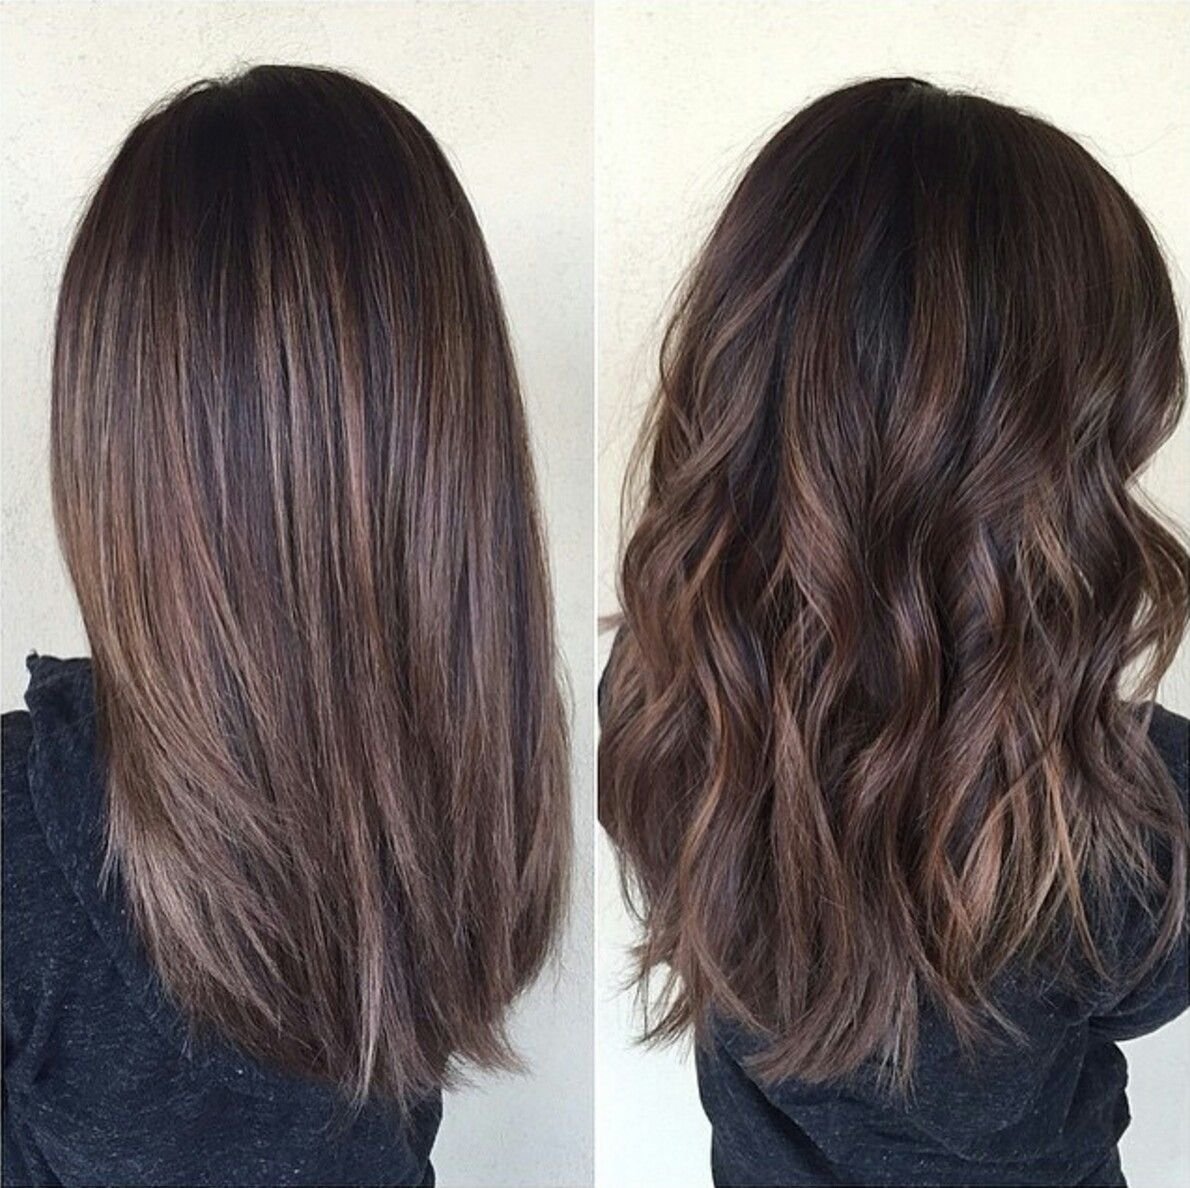 Pin By Beata Vincze On Hair Balayage Straight Hair Brown Straight Hair Hair Styles